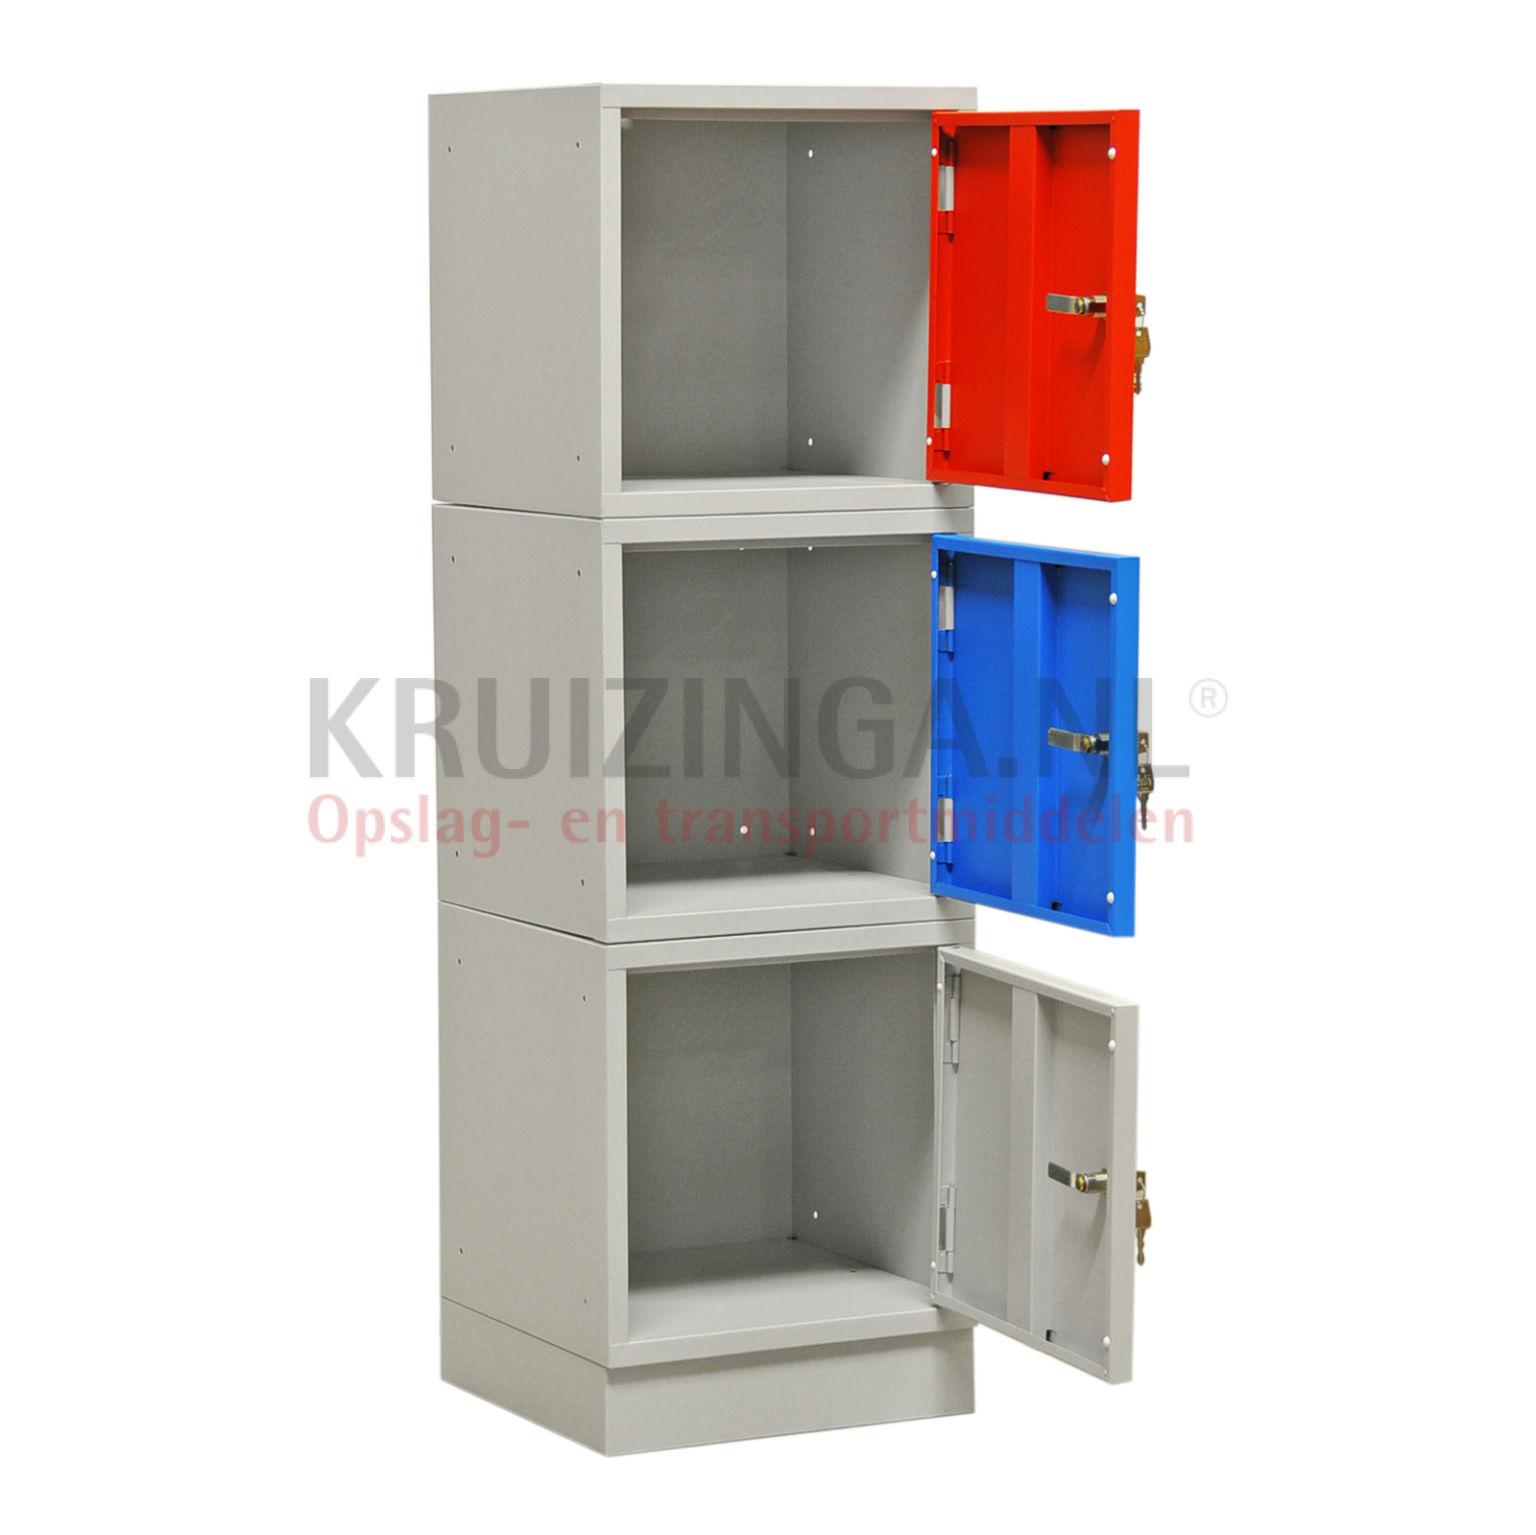 schrank helmschrank 1 t r sektion zylinderschloss 153 frei haus. Black Bedroom Furniture Sets. Home Design Ideas